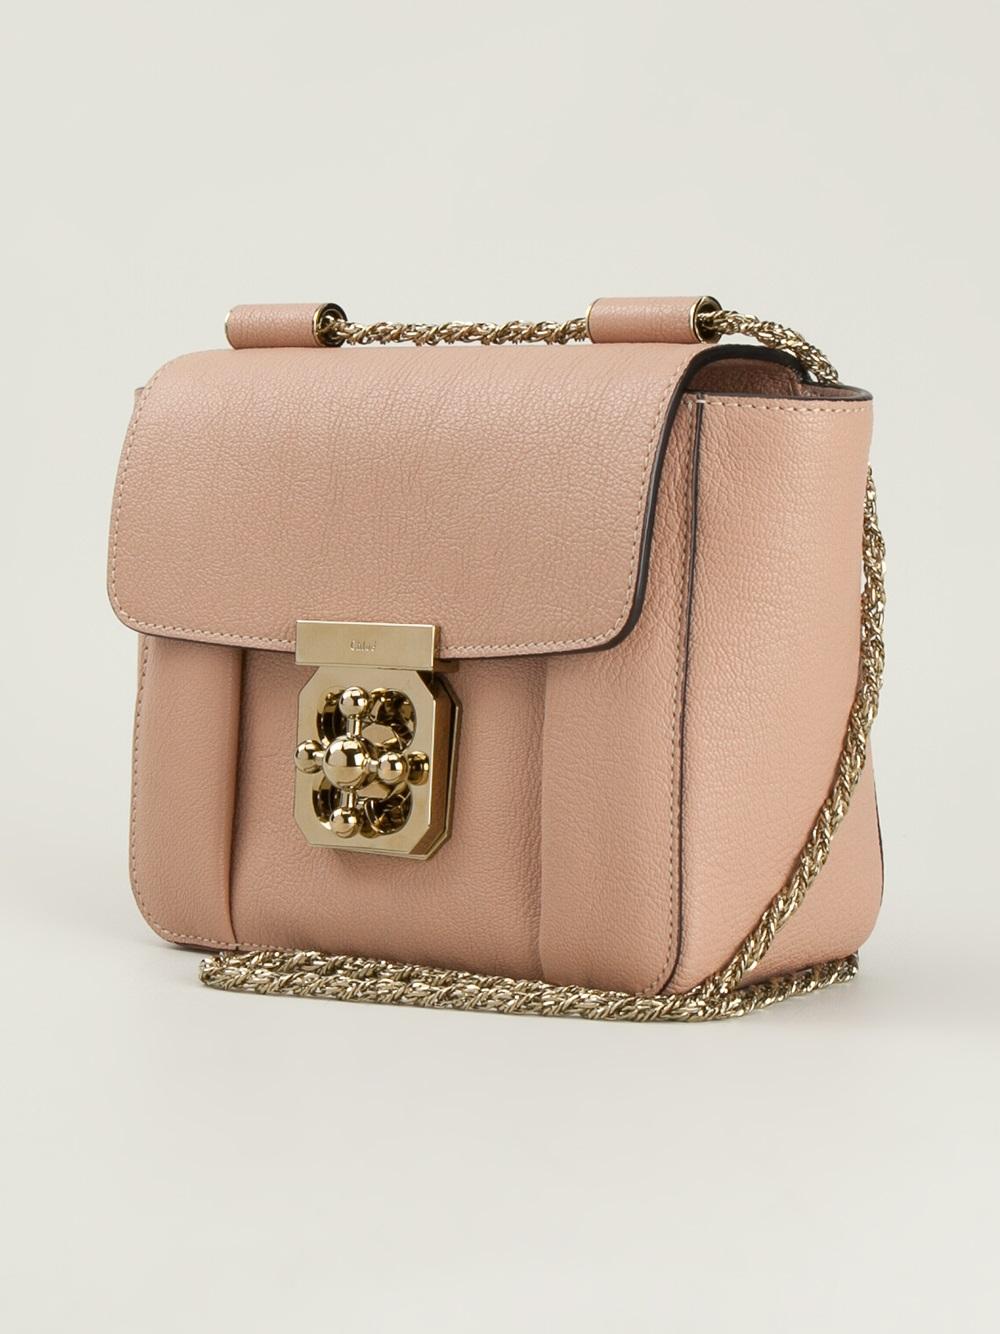 4e445ddc274 Chloé Small  Elsie  Shoulder Bag - Lyst